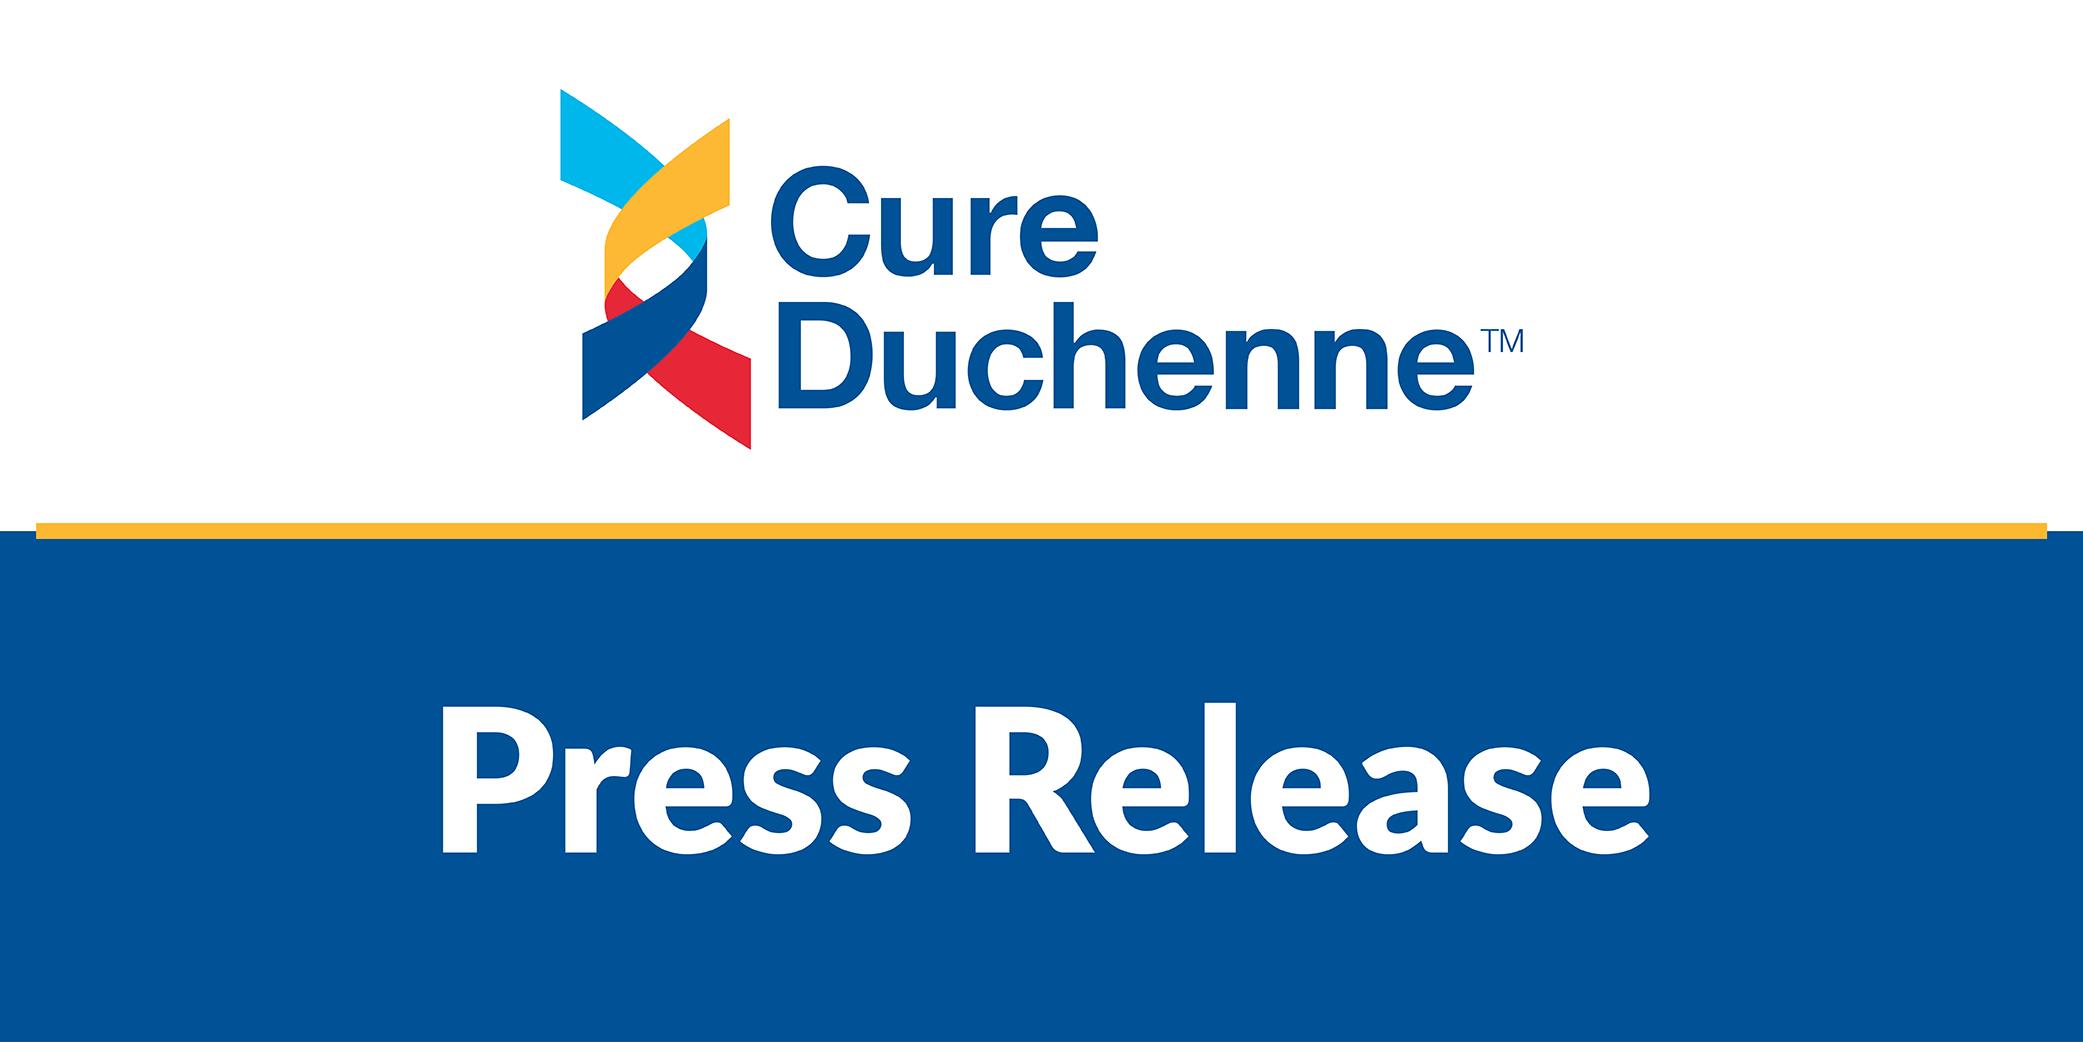 cure-duchenne-press-release